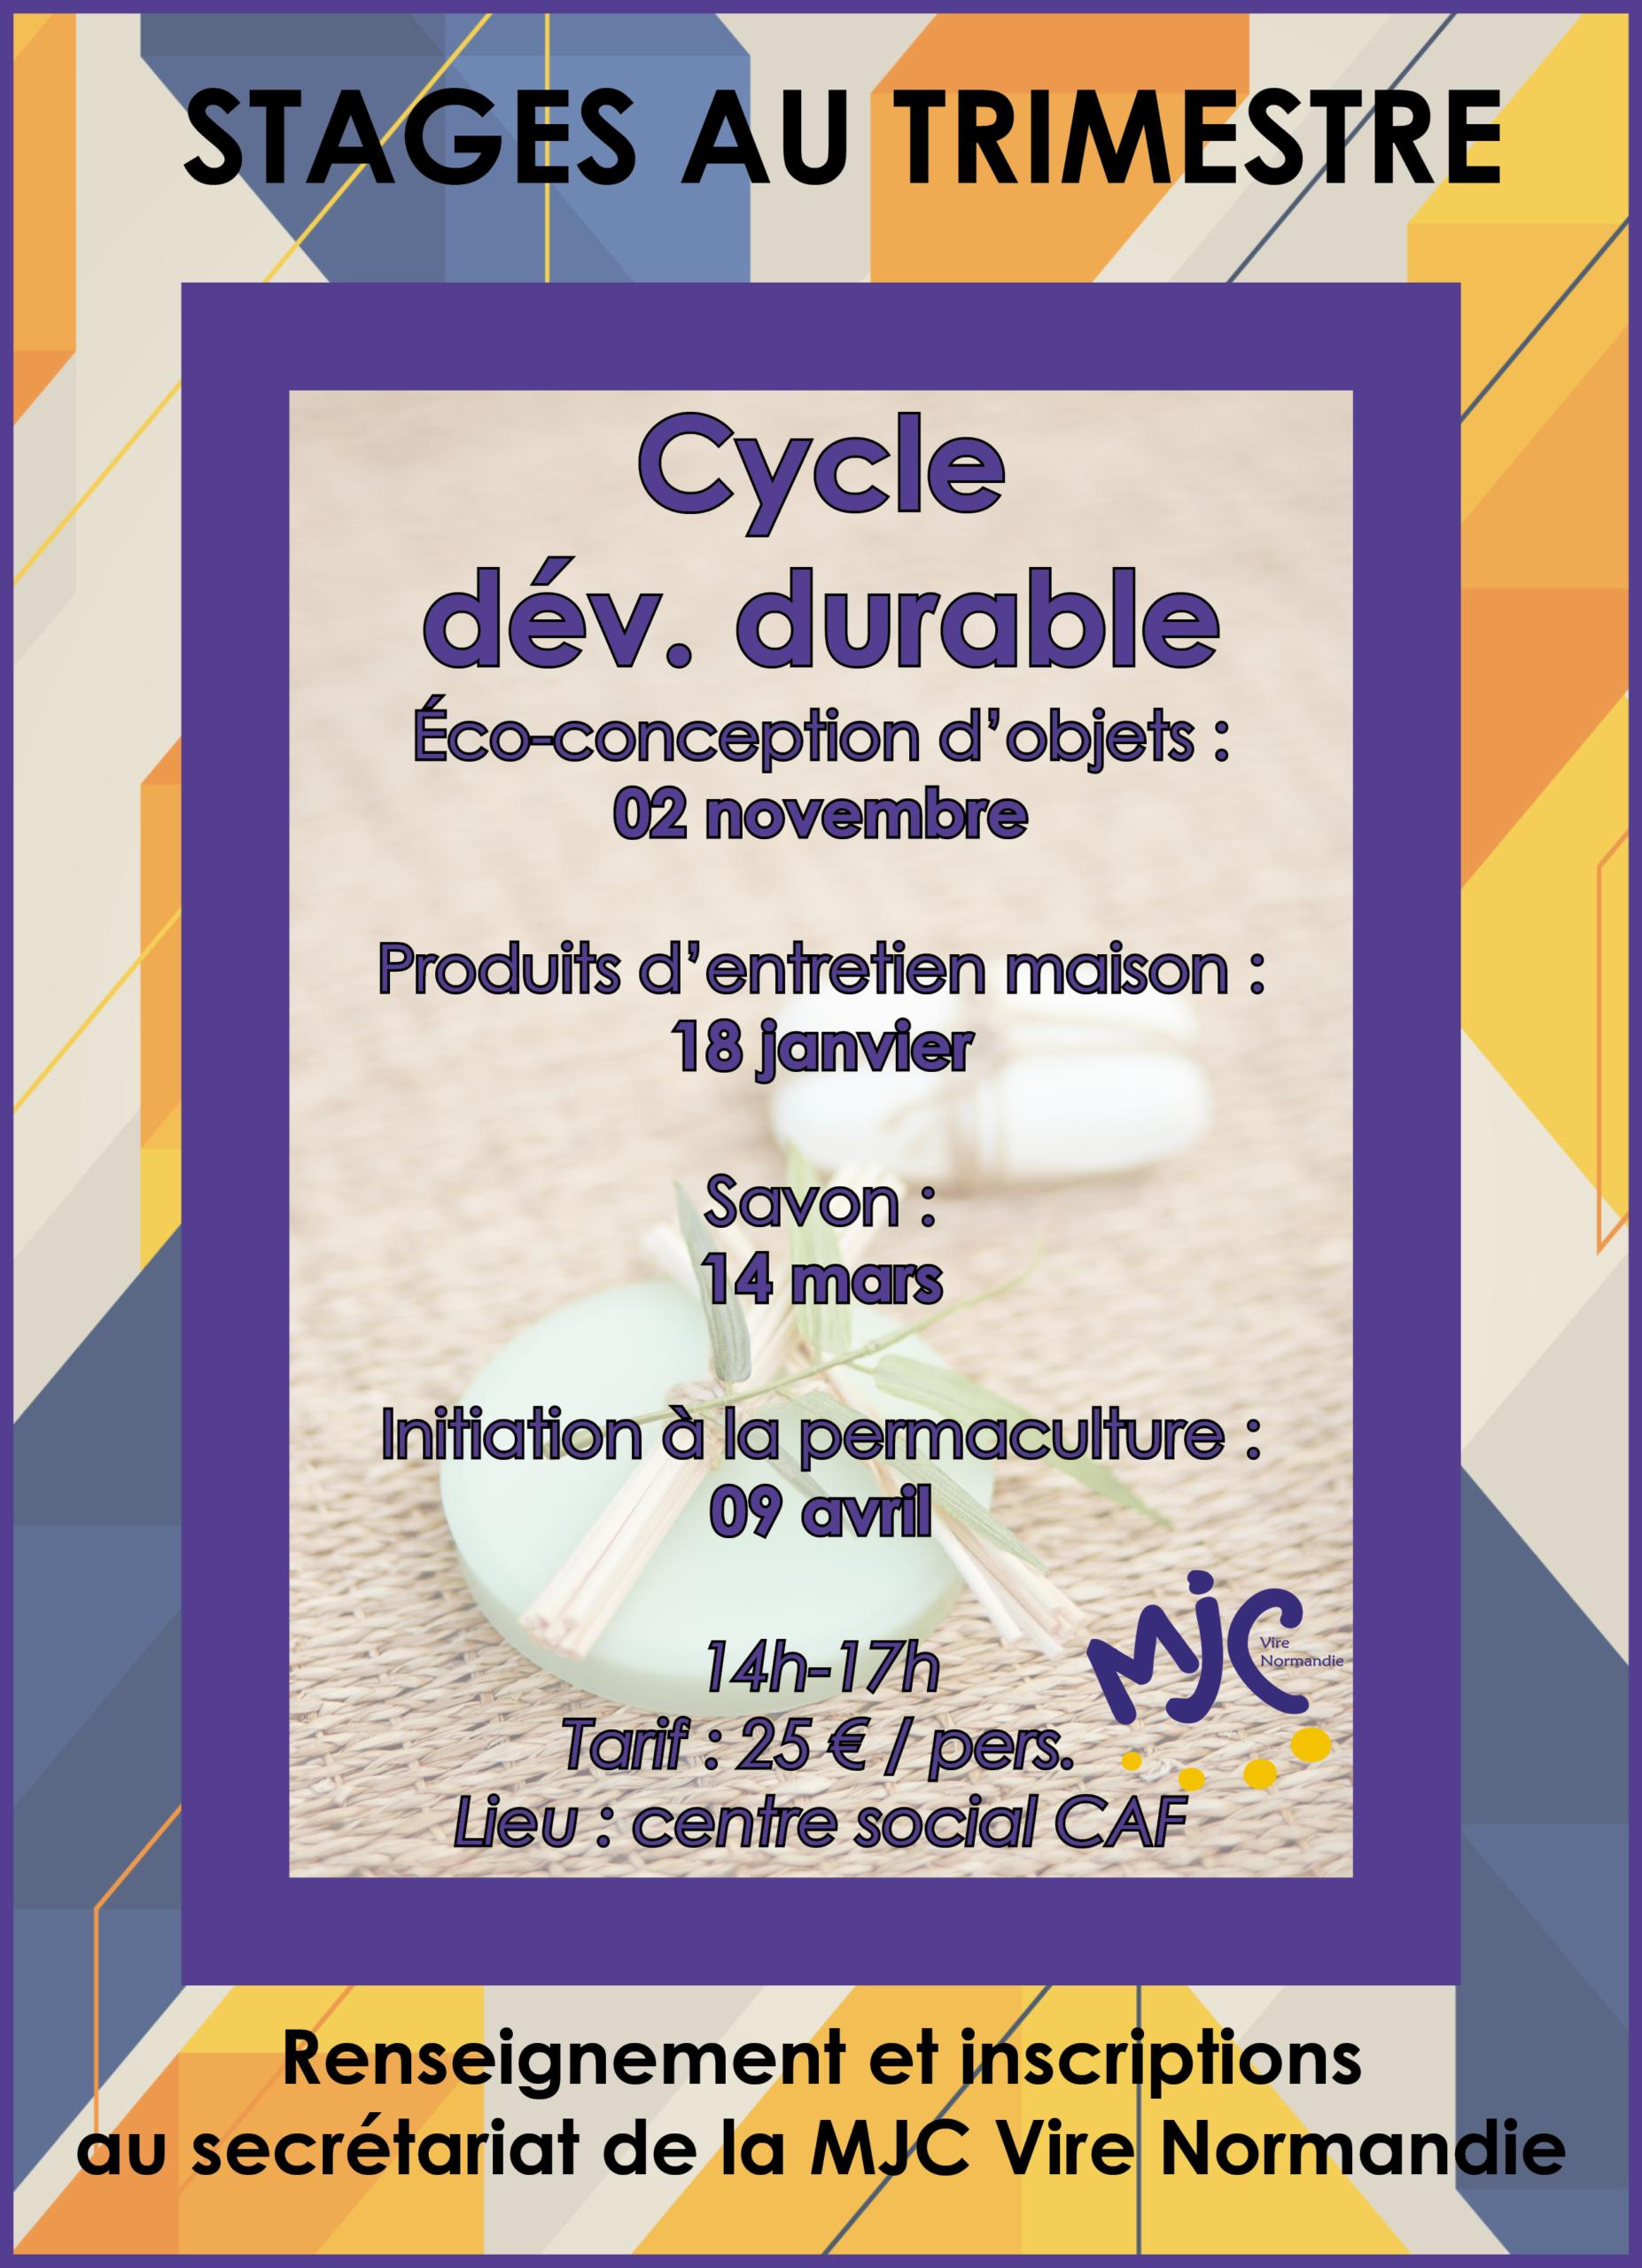 cycle dev durable